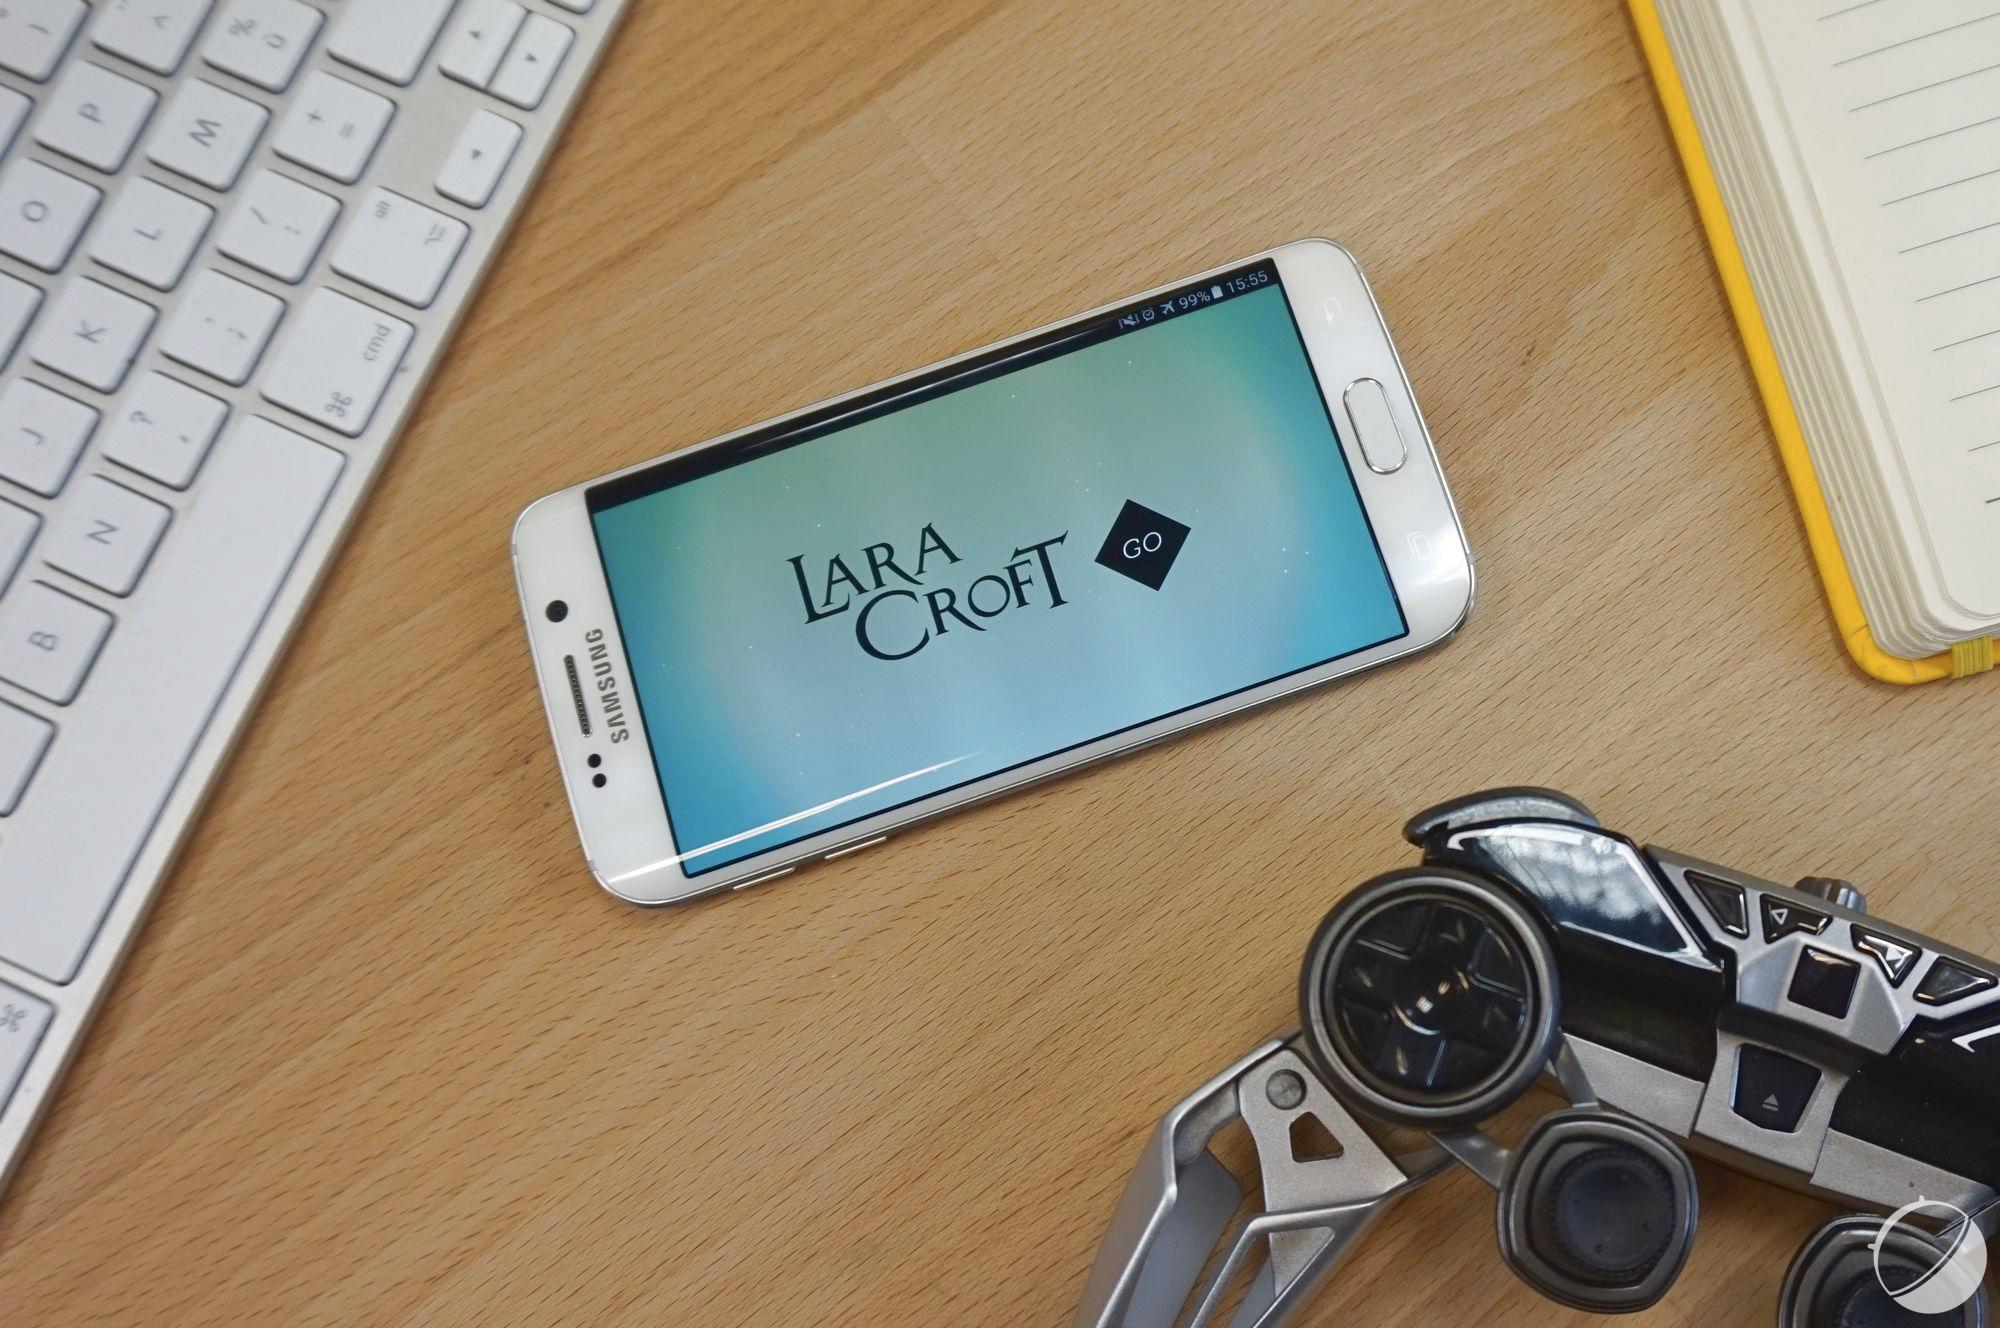 les meilleurs jeux hors ligne sur smartphones et tablettes android en 2018 frandroid. Black Bedroom Furniture Sets. Home Design Ideas